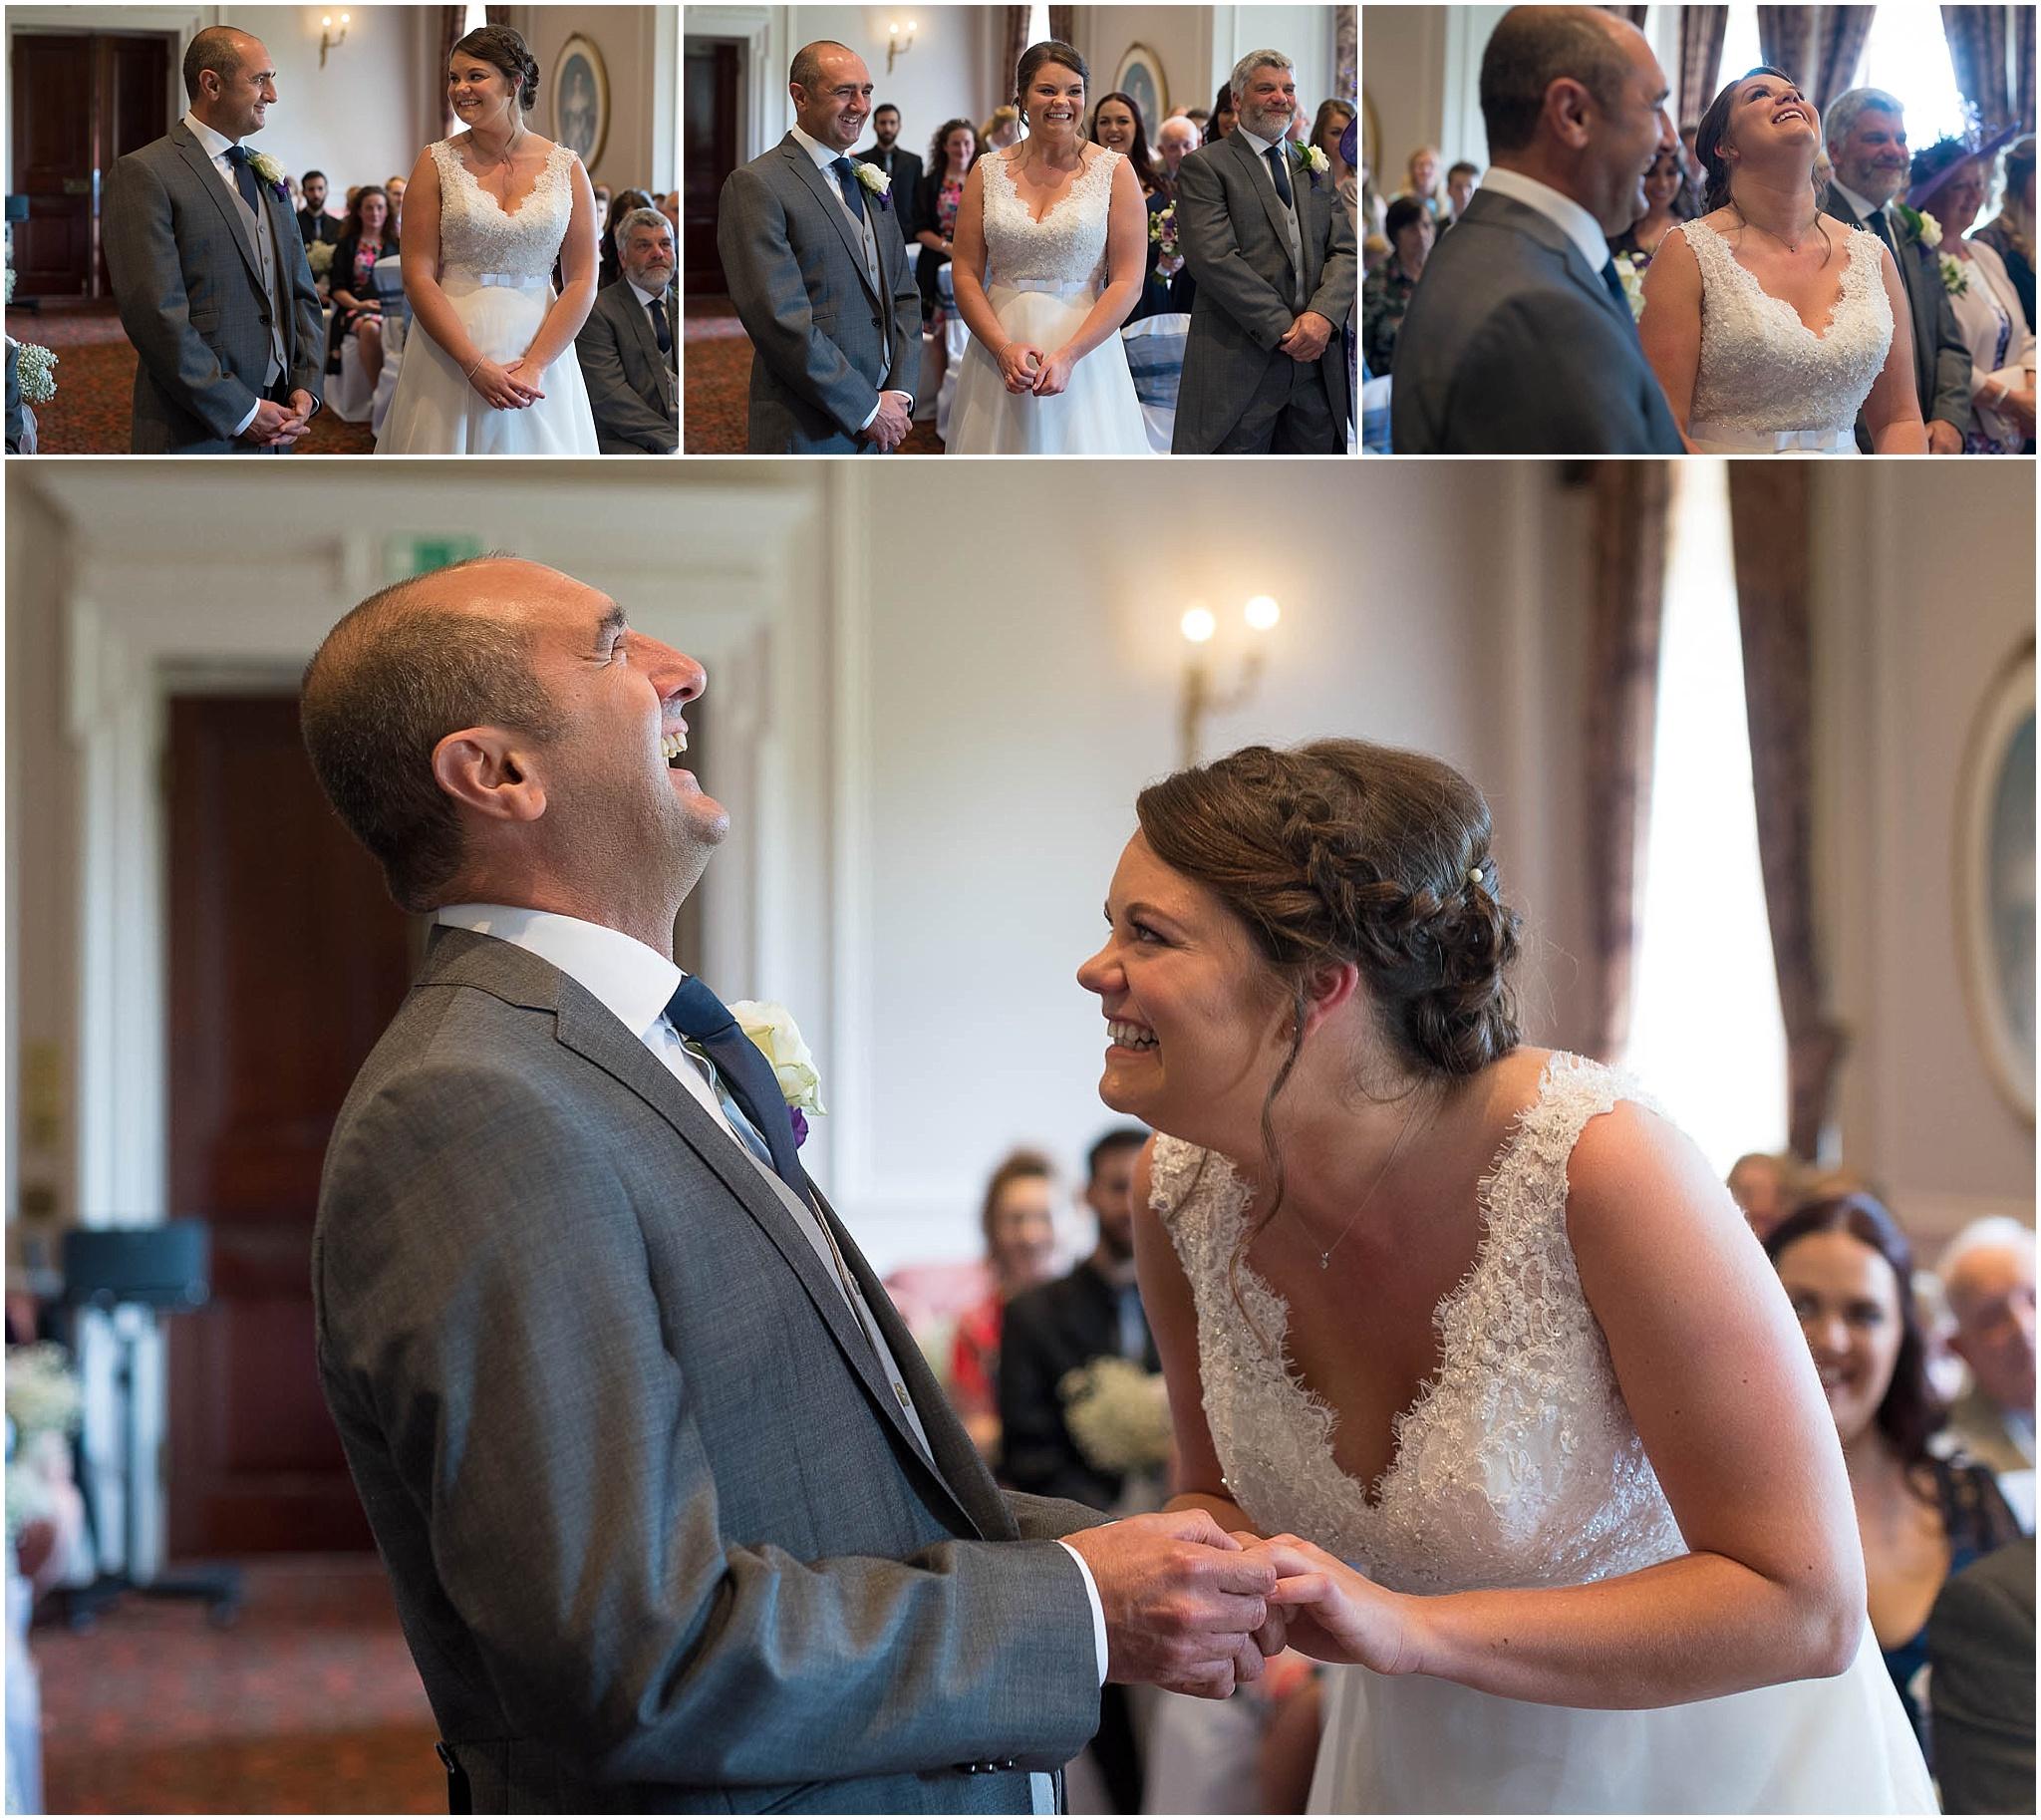 Crathorne Hall Hotel Wedding Photographer108.jpg